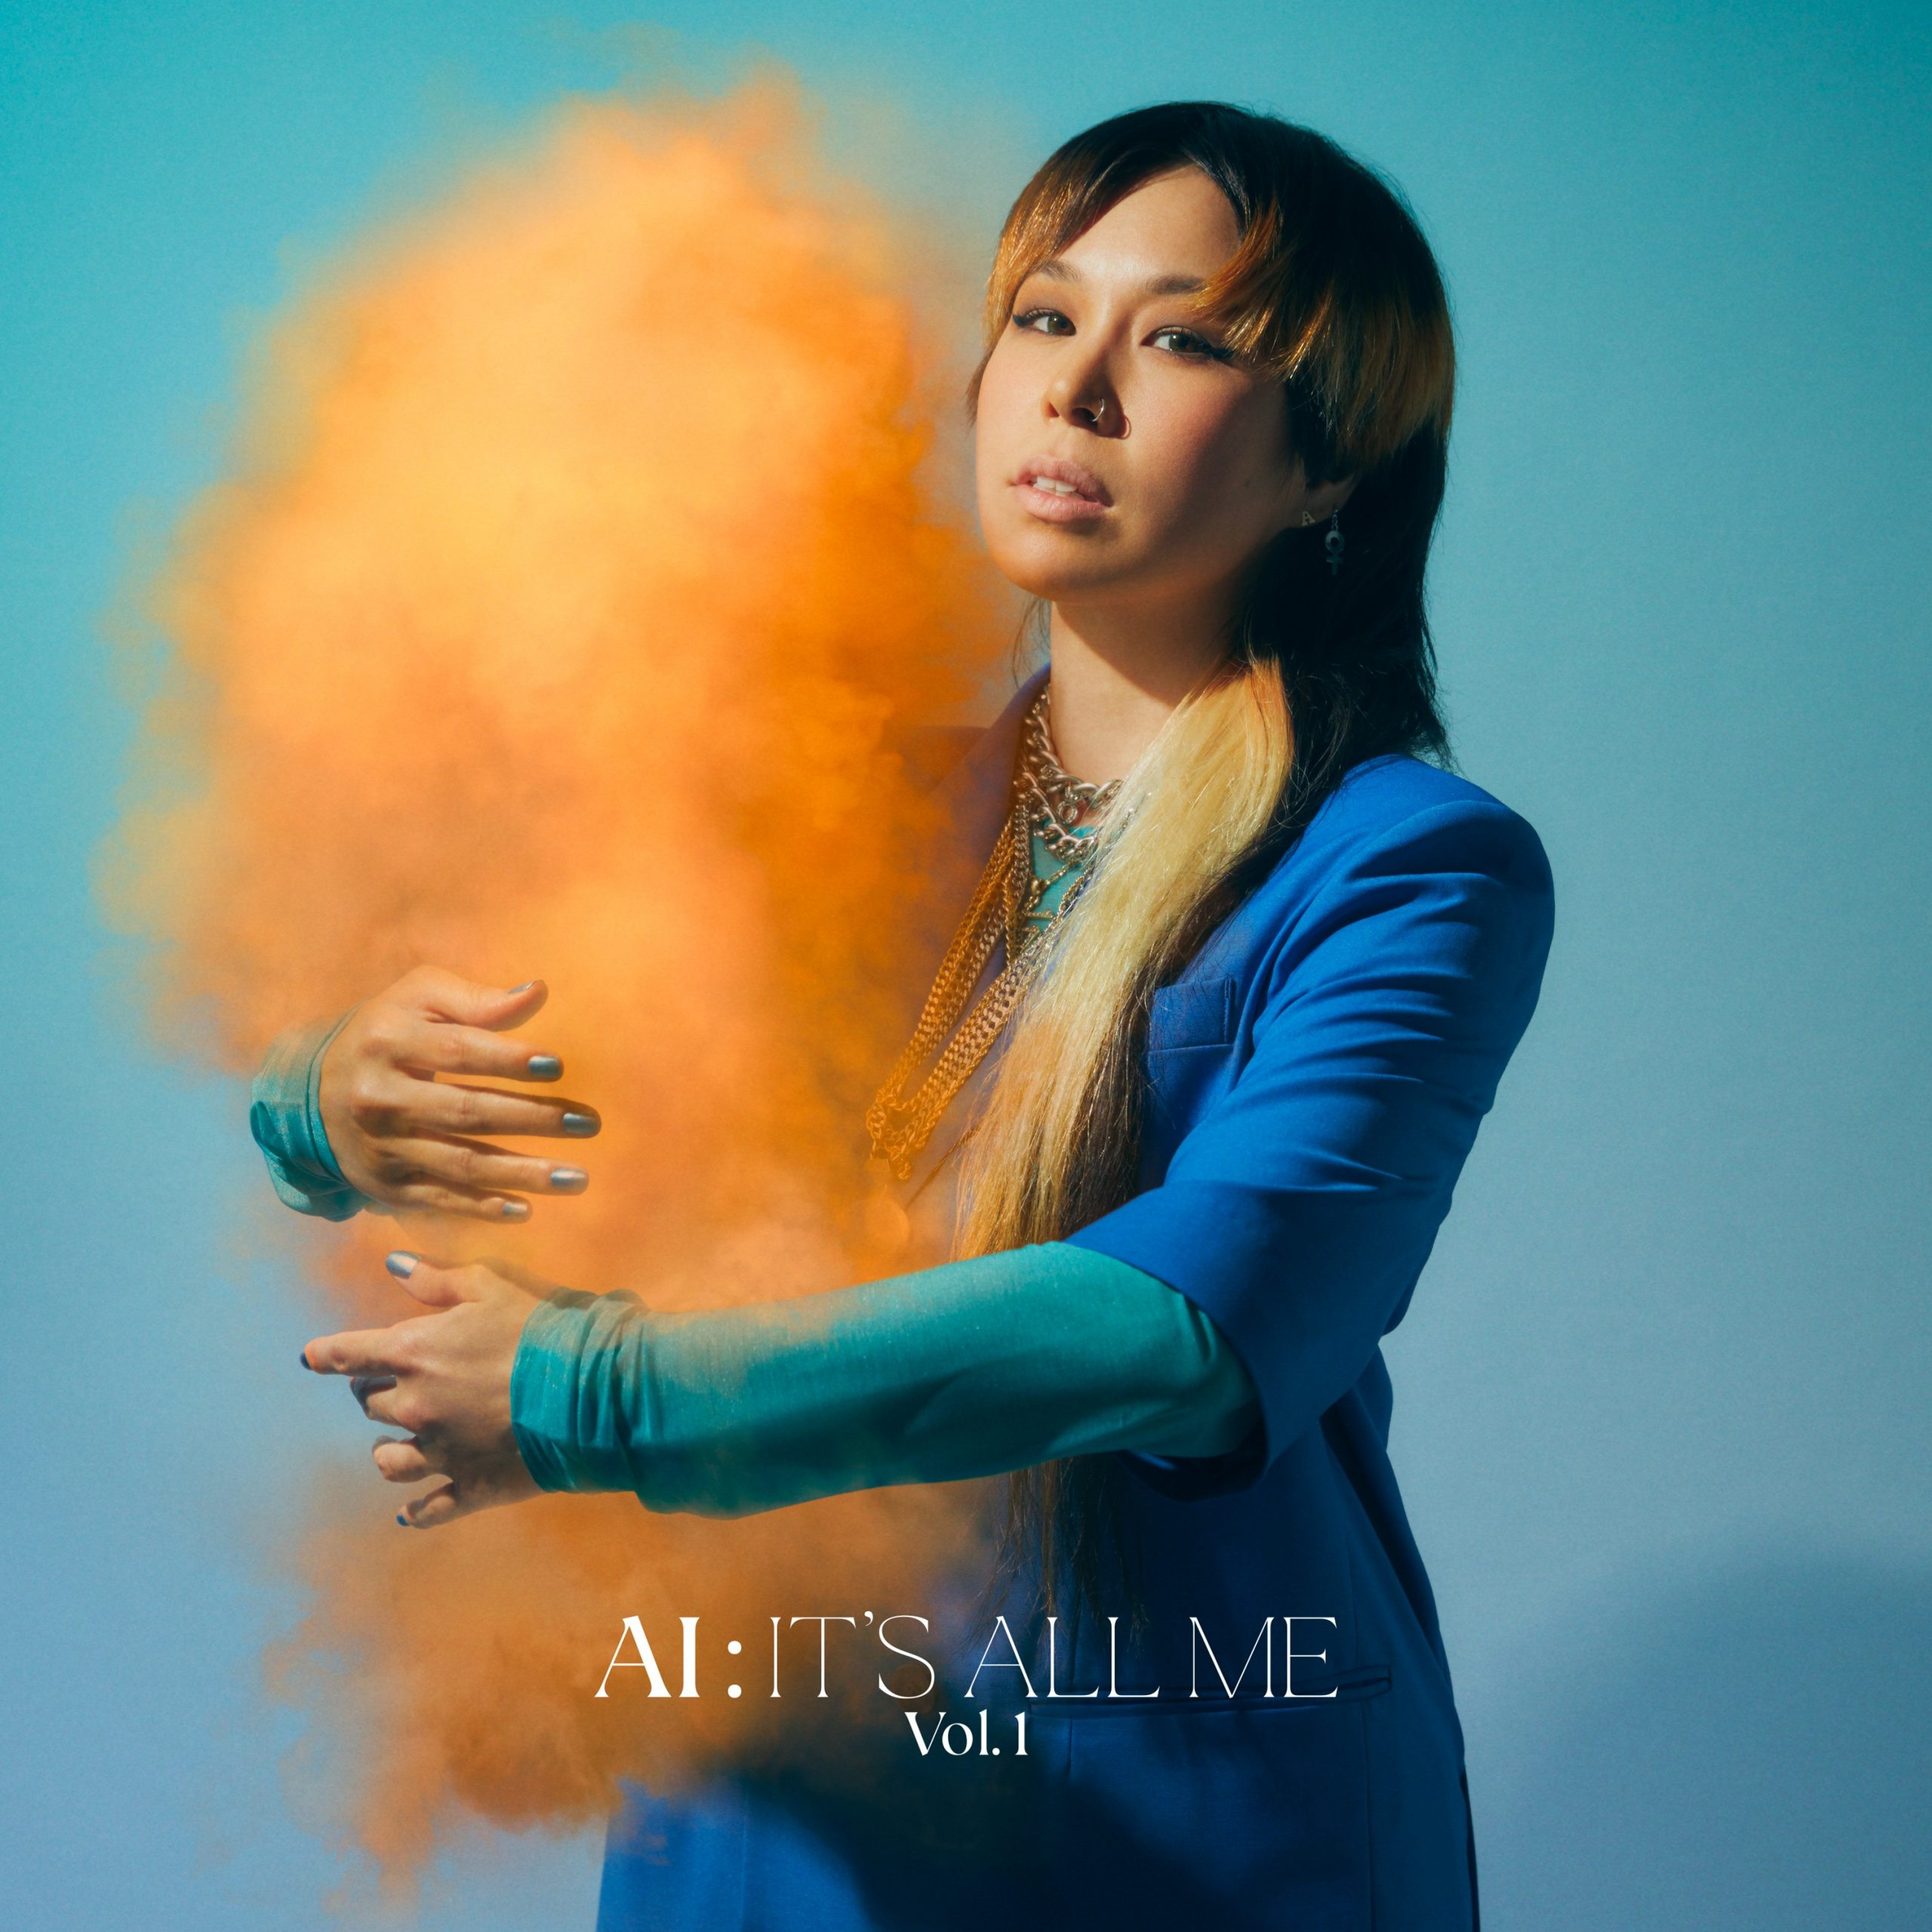 Download Album AI IT'S ALL ME – Vol.1 Flac